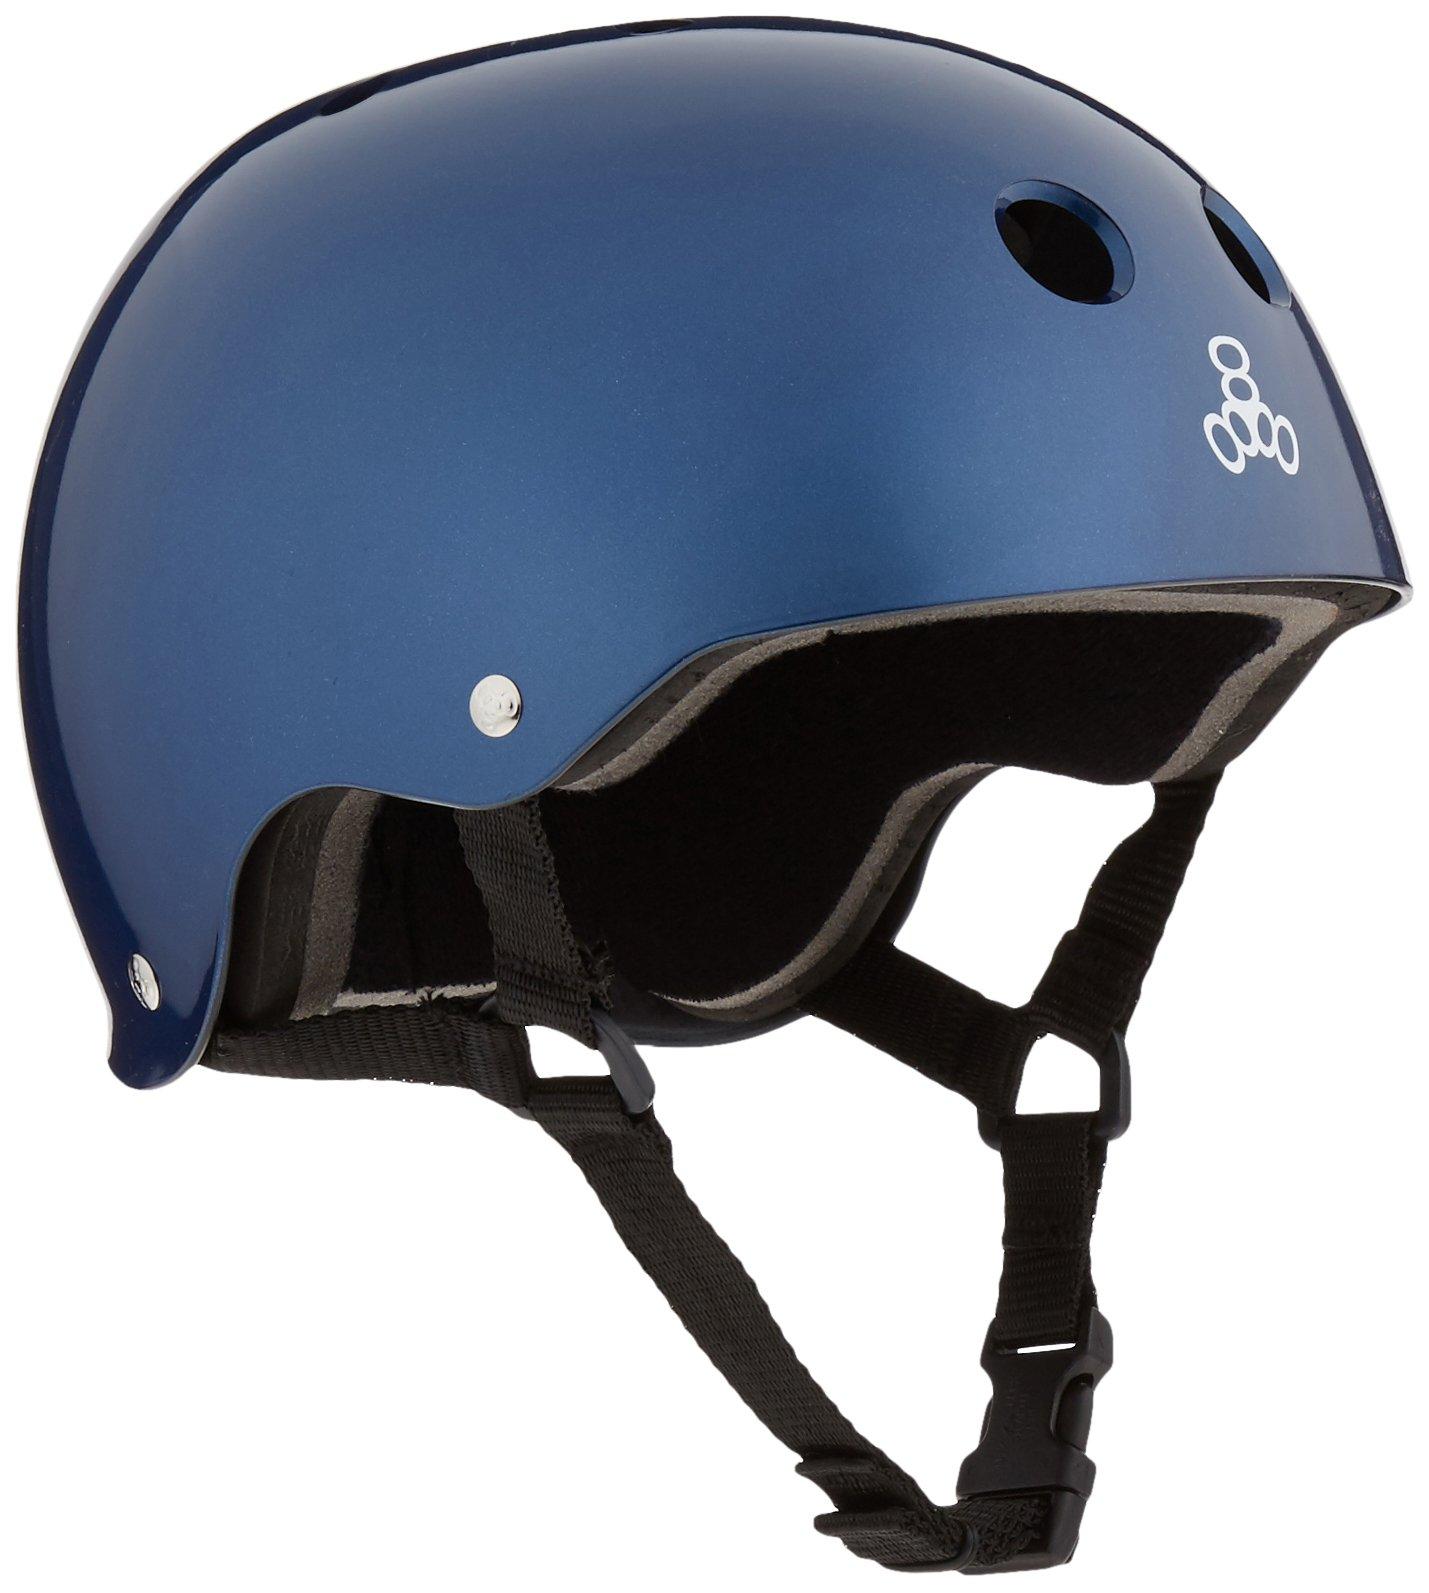 Triple 8 Standard Liner Skateboarding Helmet, Blue Metallic, L